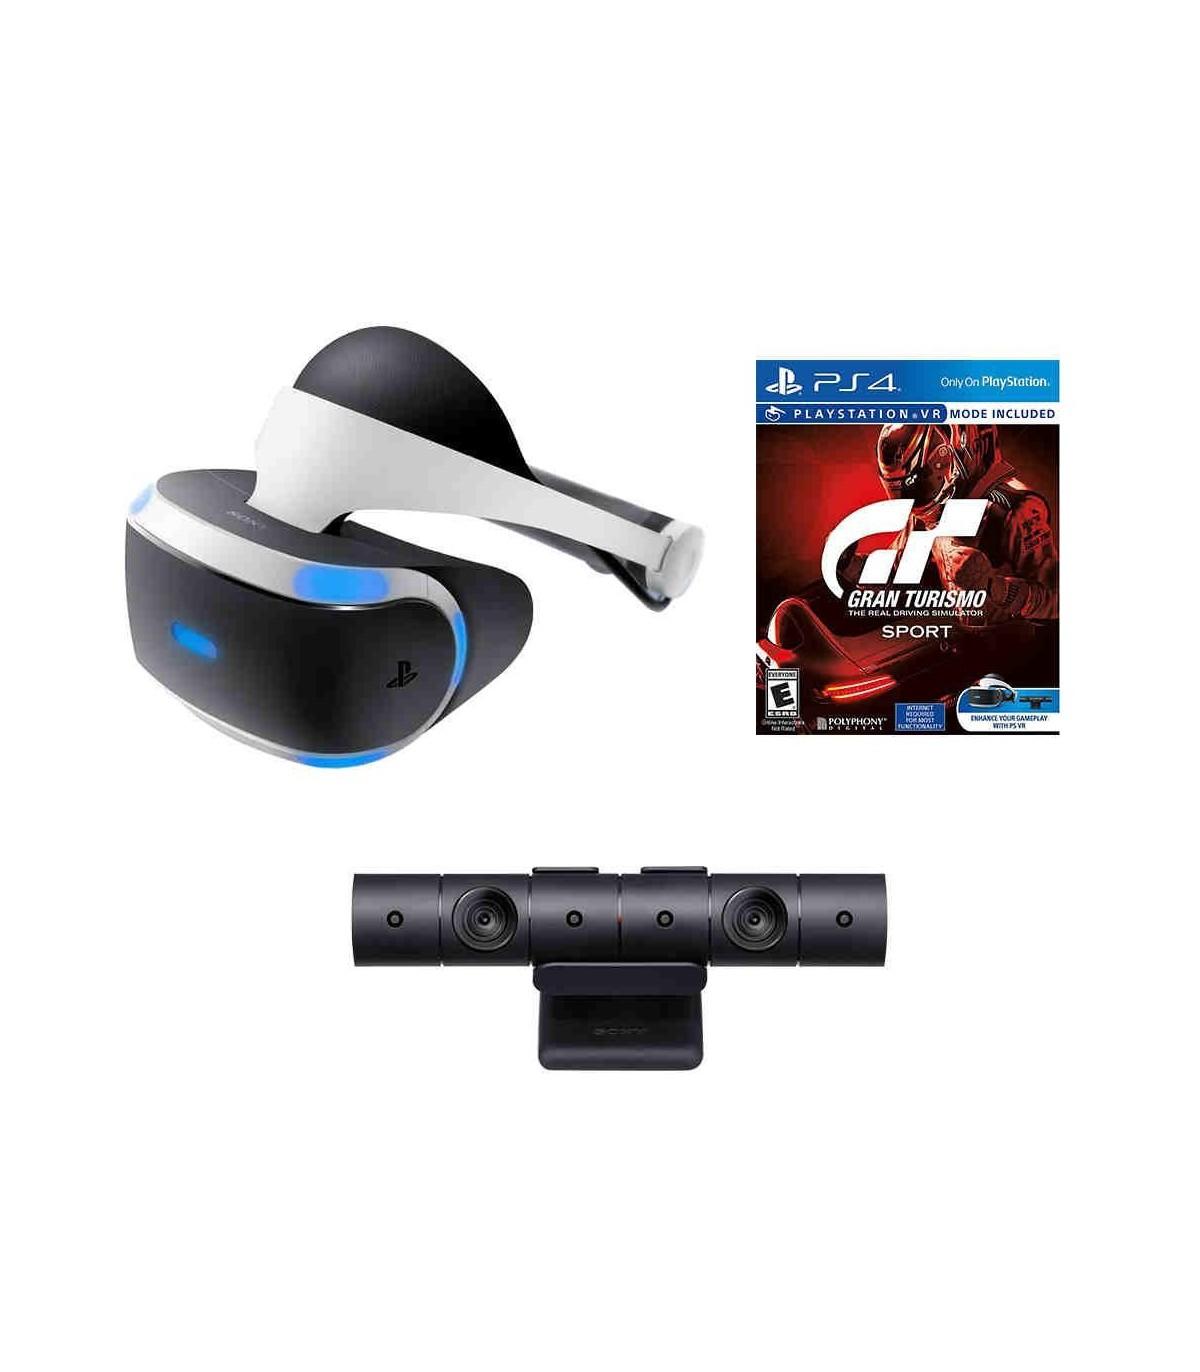 باندل پلی استیشن وی ار Sony PlayStation VR Bundle Virtual Reality Headset